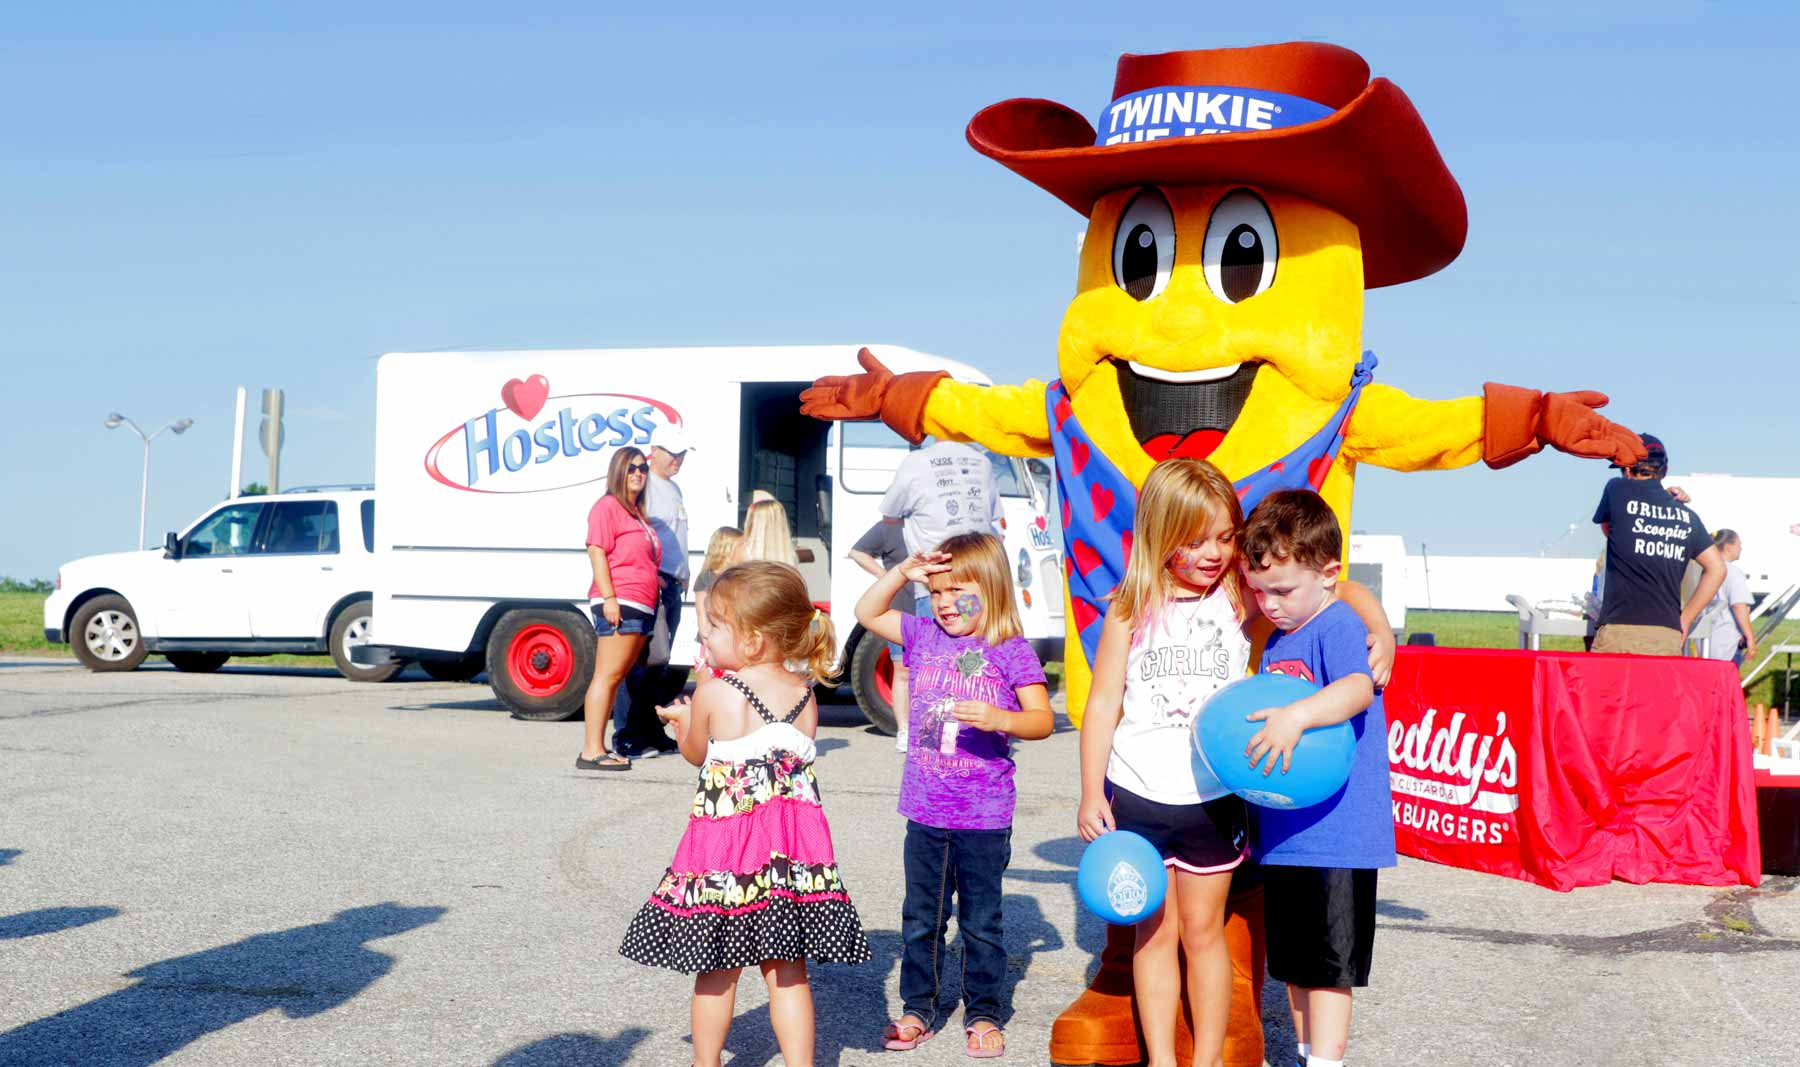 Twinkies Festival October 14 at Lyon County Fairgounds